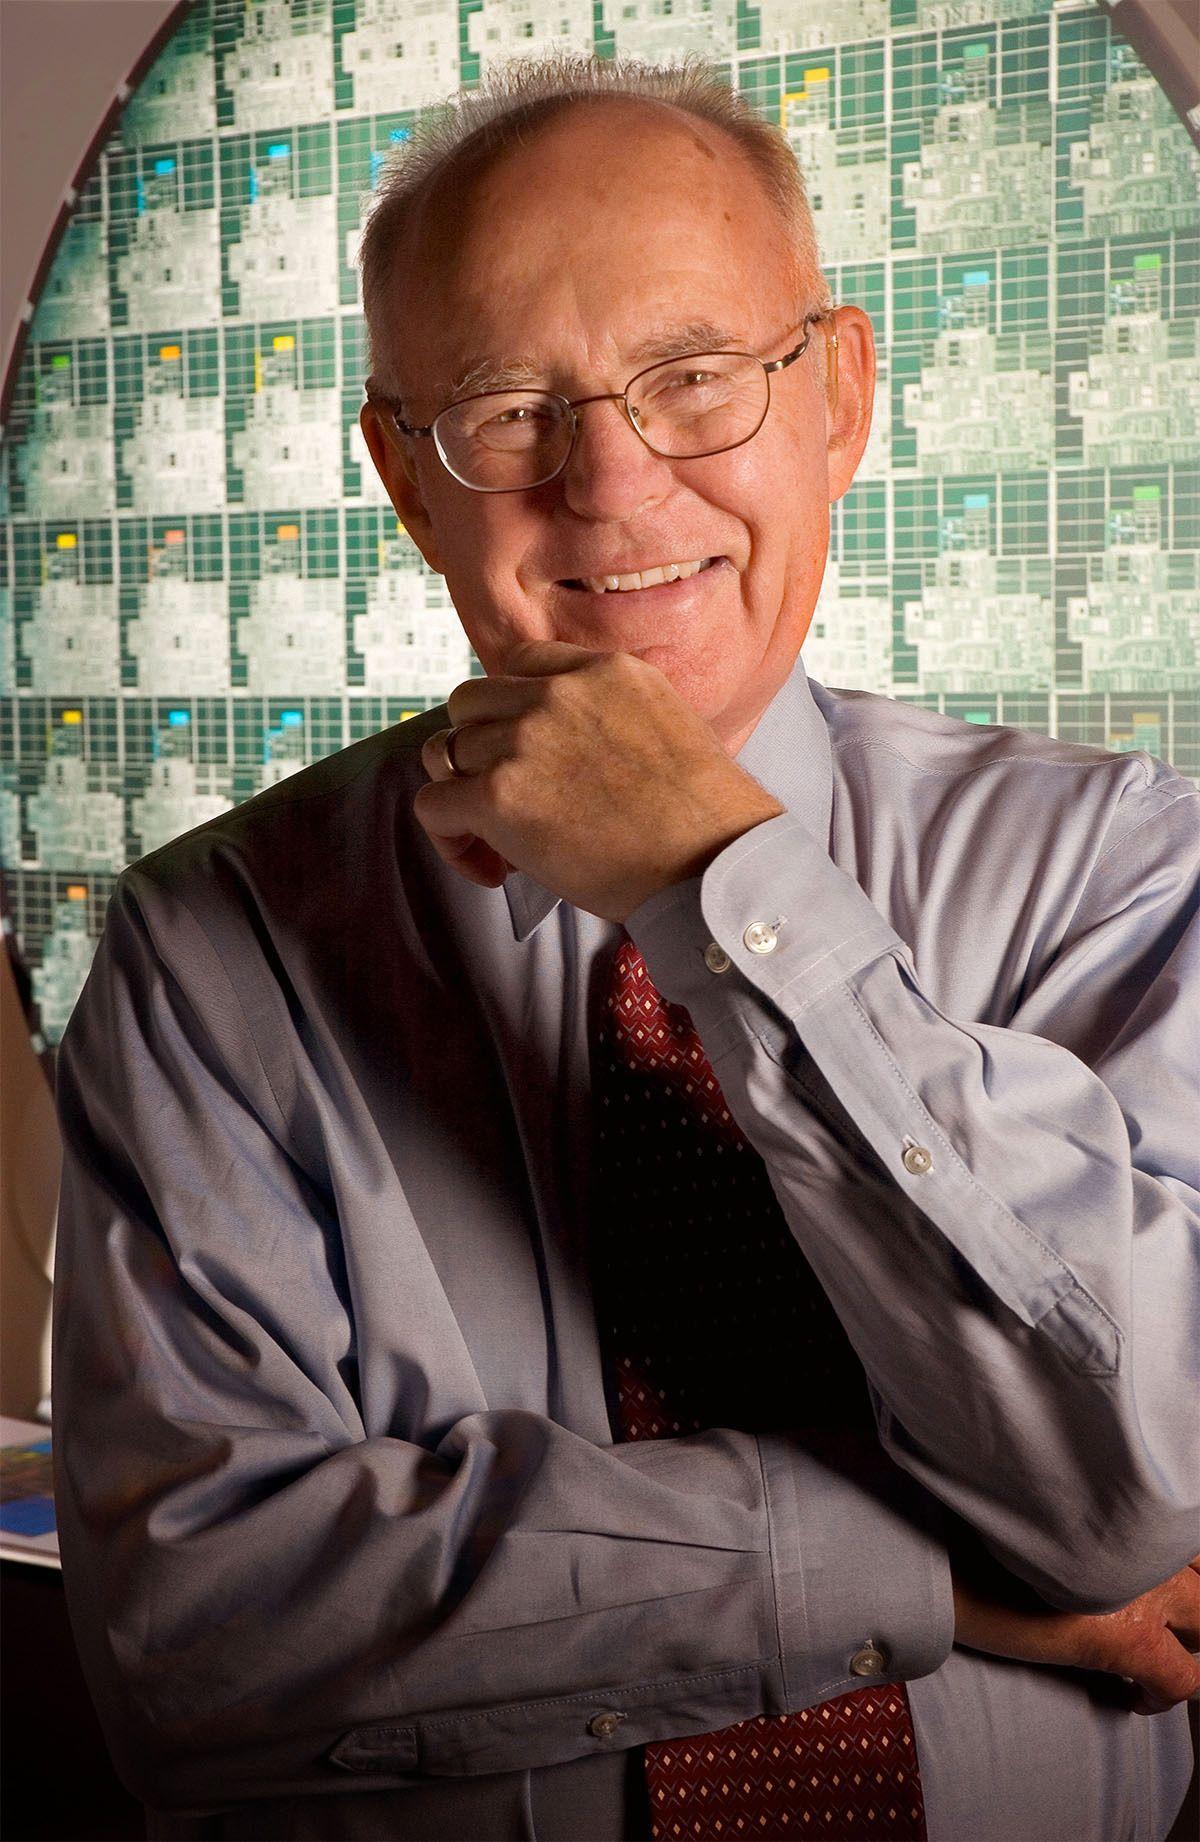 Gordon Moore, med-gründer og tidligere styreformann i Intel. Foto: Intel